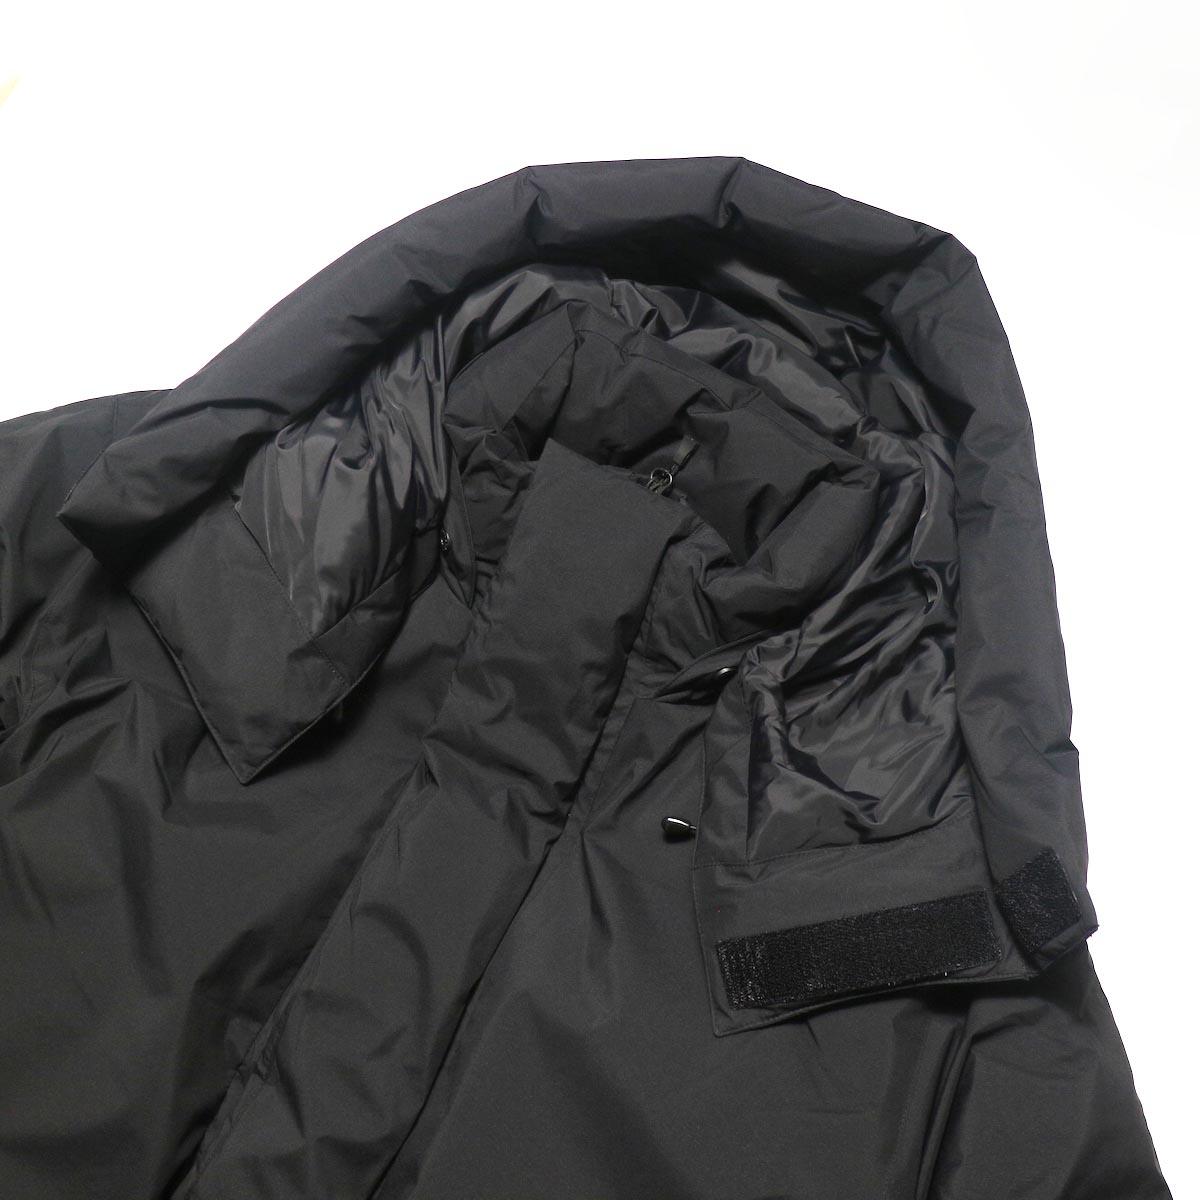 DAIWA PIER39 / GORE-TEX INFINIUM EXPEDITION DOWN JACKET (Black)フード、襟